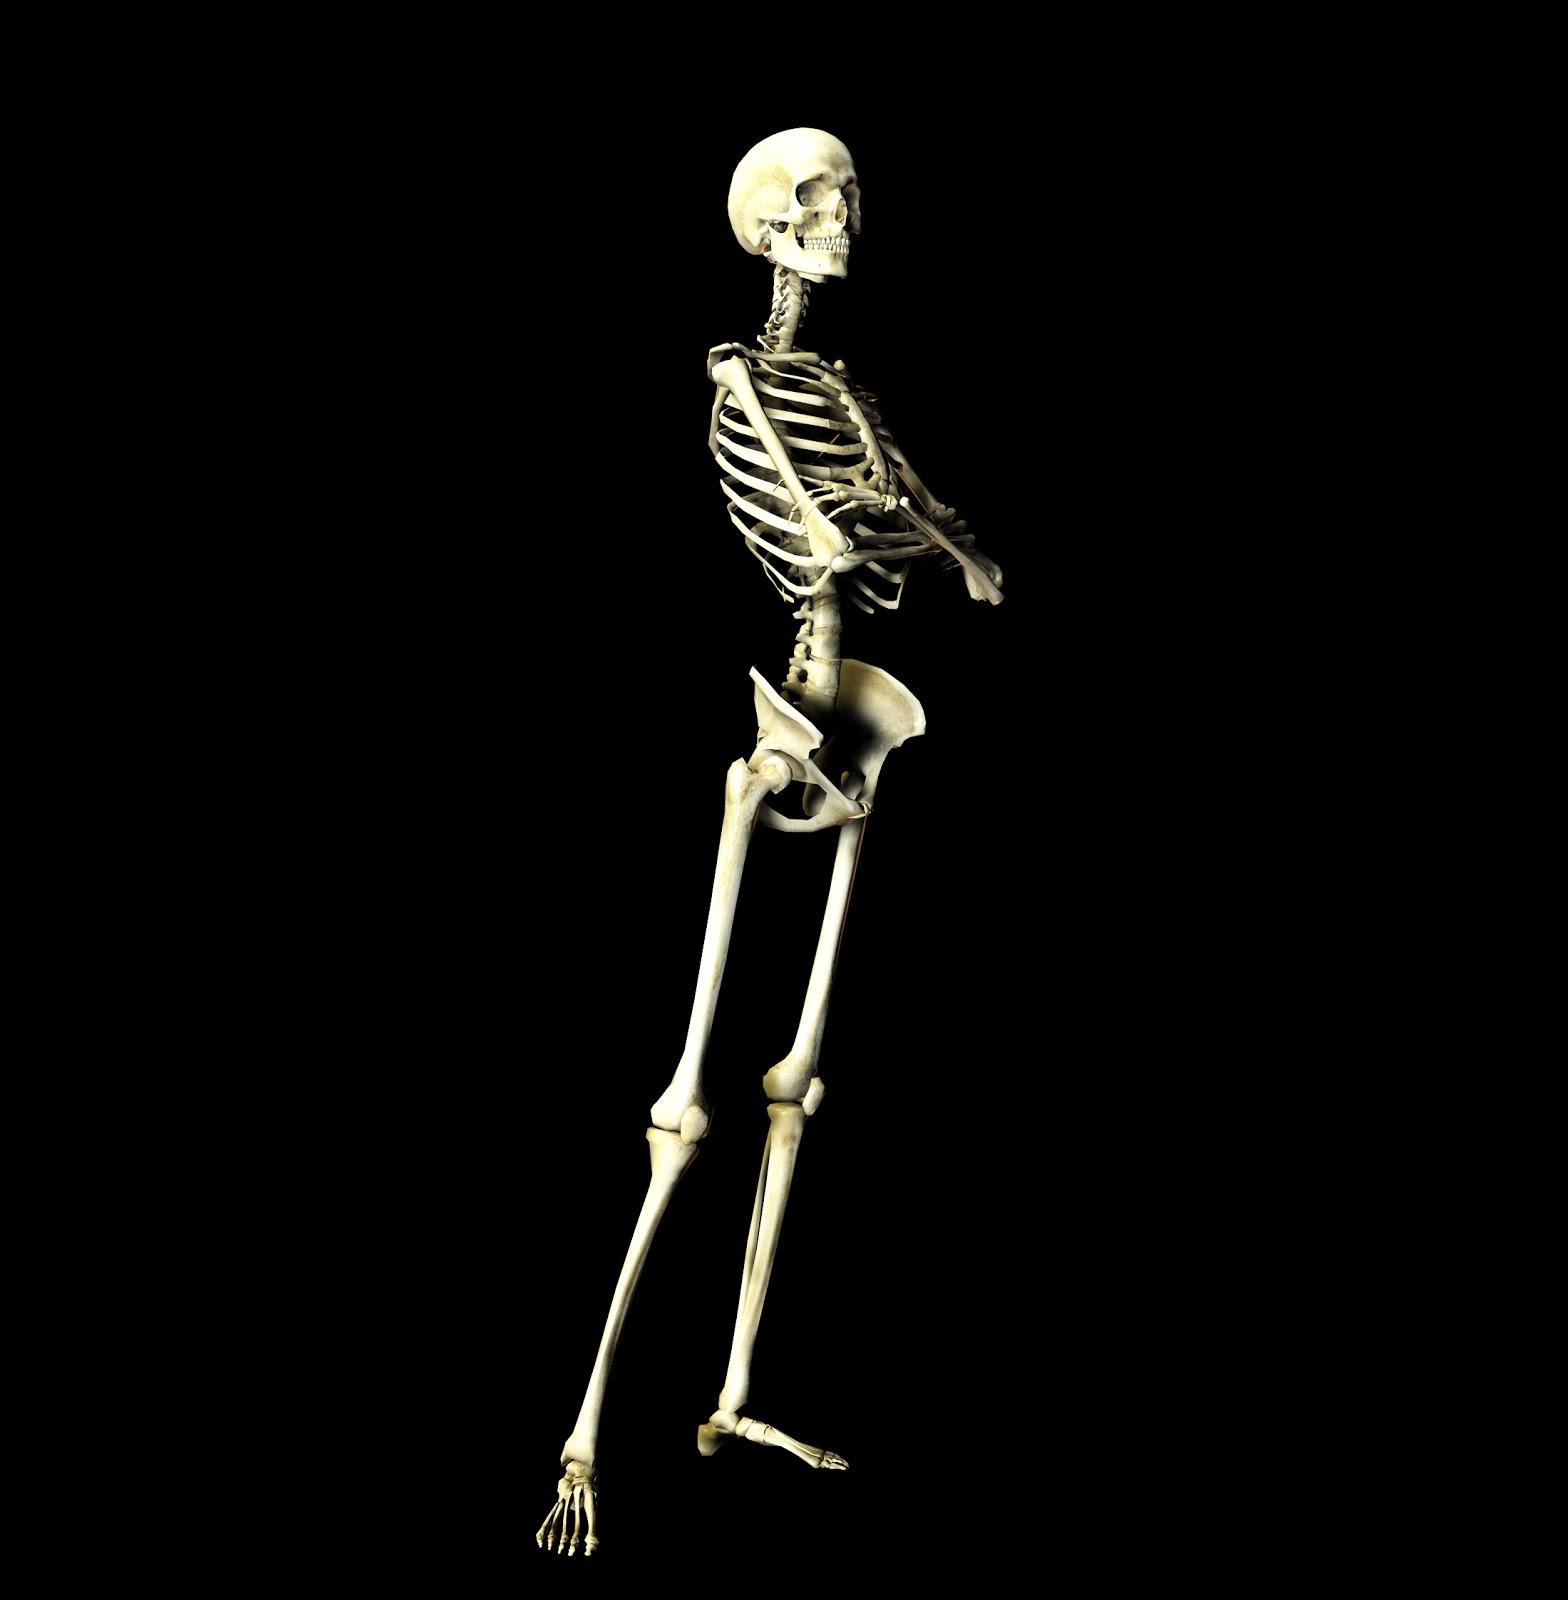 http://2.bp.blogspot.com/-Y9hmPElPYzw/UQ-kz-4rICI/AAAAAAAABPc/ZyYvCae3jN4/s1600/skeleton.jpg